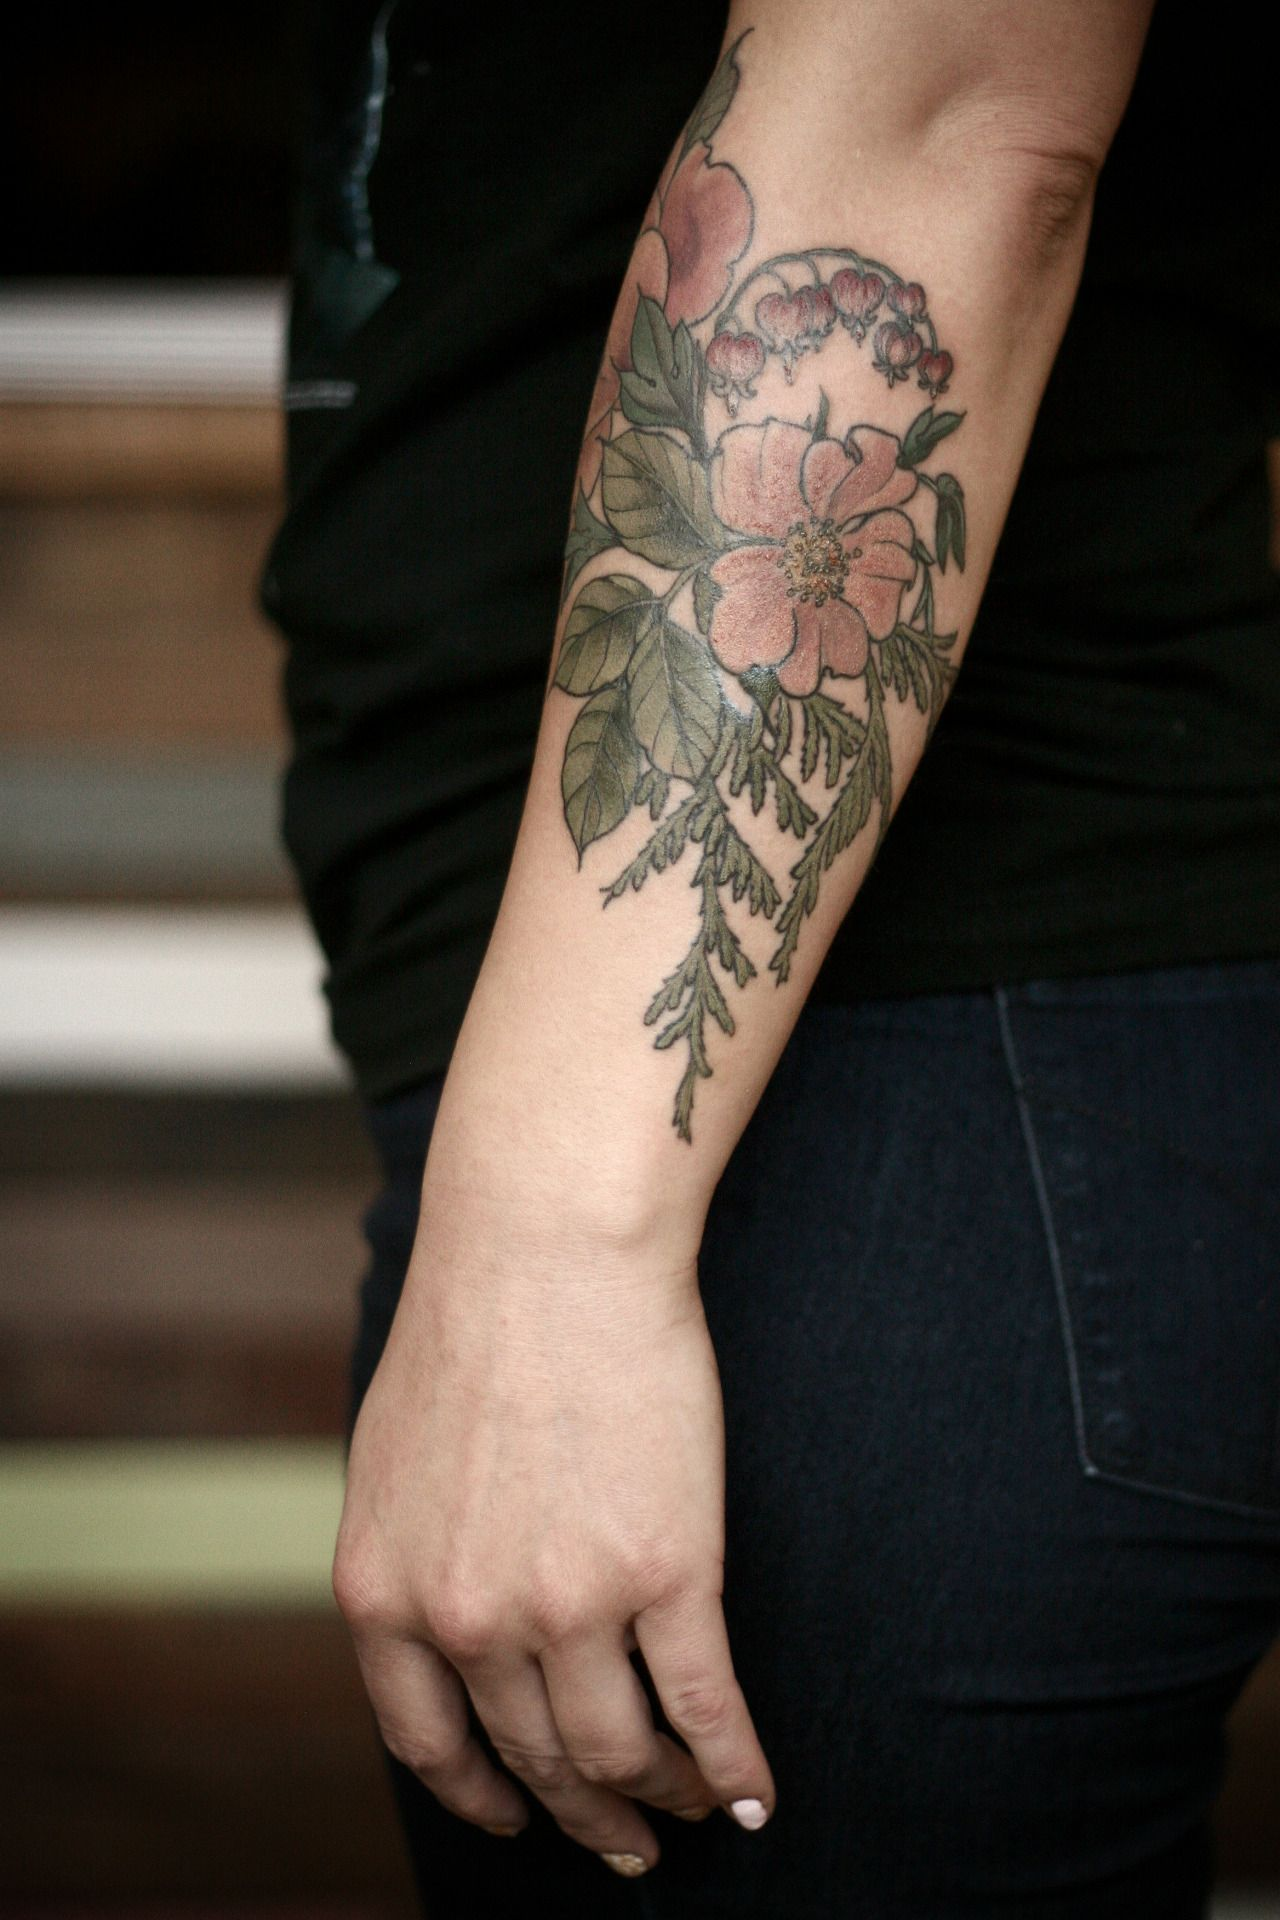 Https Www Reddit Com Forearm Cover Up Tattoos Tattoos Cool Tattoos